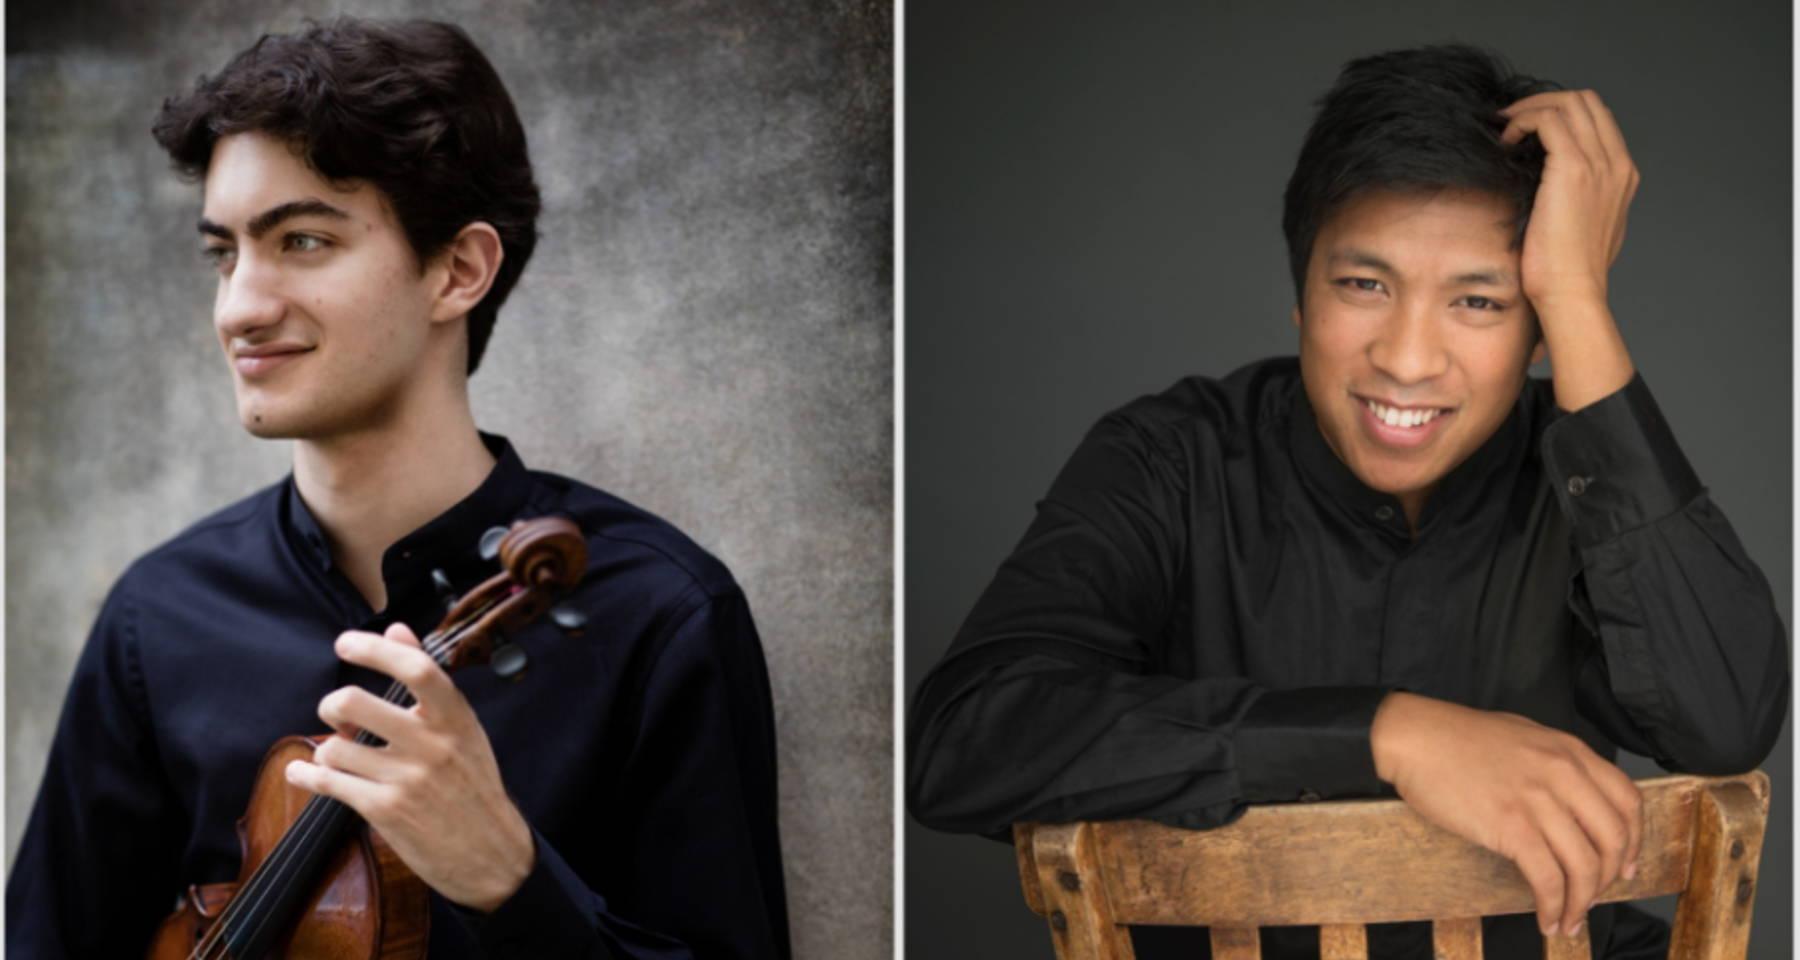 Stephen Waarts and Yannick Rafalimanana | Enescu, Debussy, Tchaikovsky, Saint-Saëns/Ysaÿe